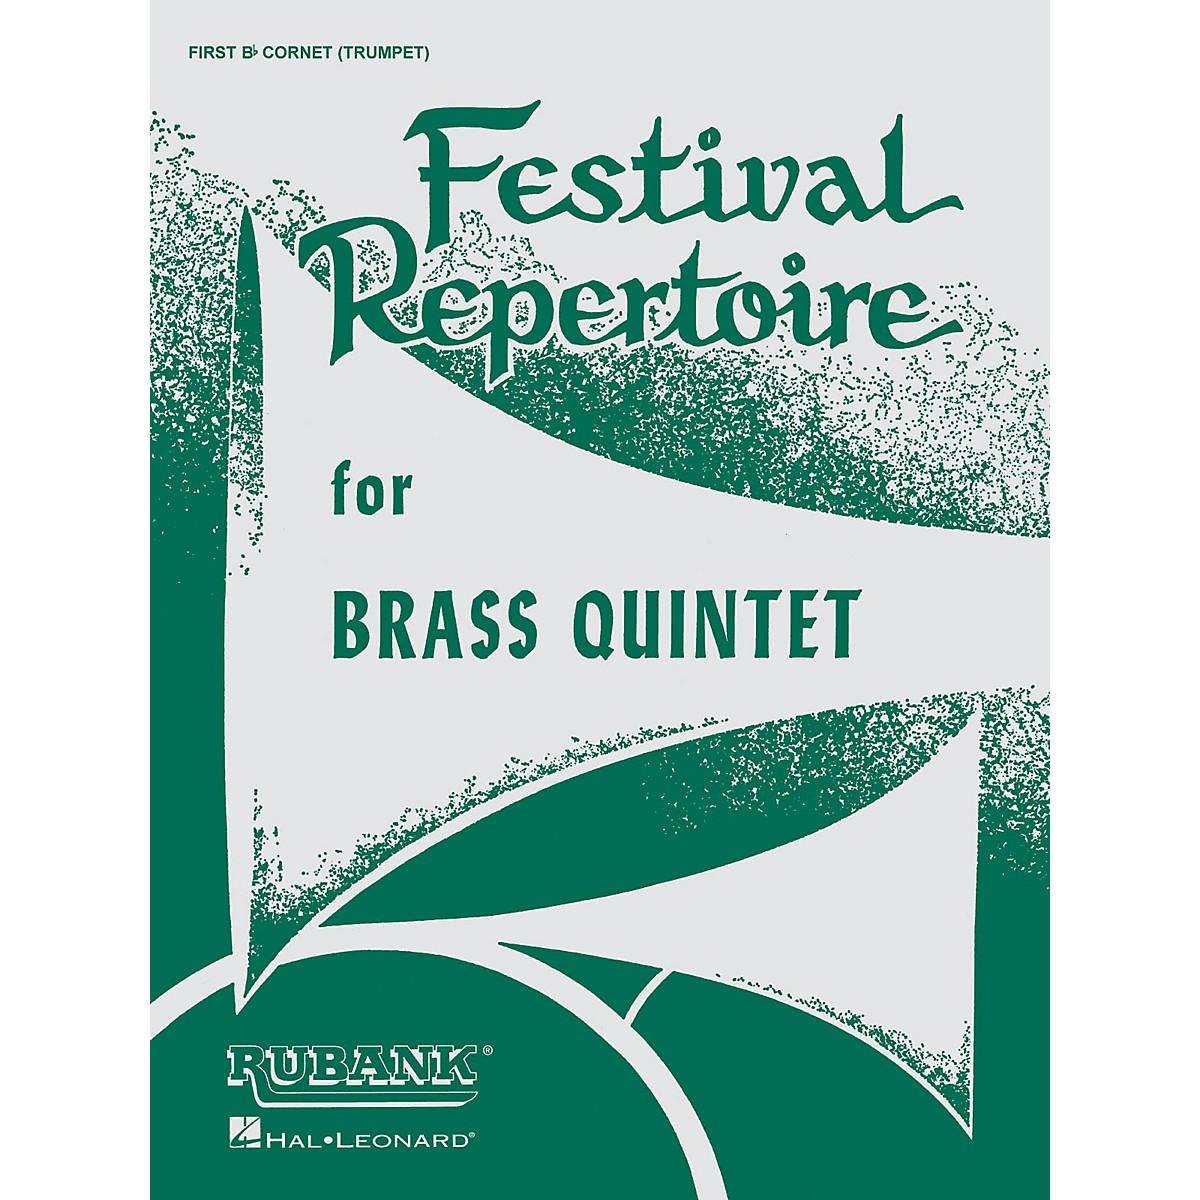 Rubank Publications Festival Repertoire for Brass Quintet (5th Part - Bass/Tuba (B.C.)) Ensemble Collection Series